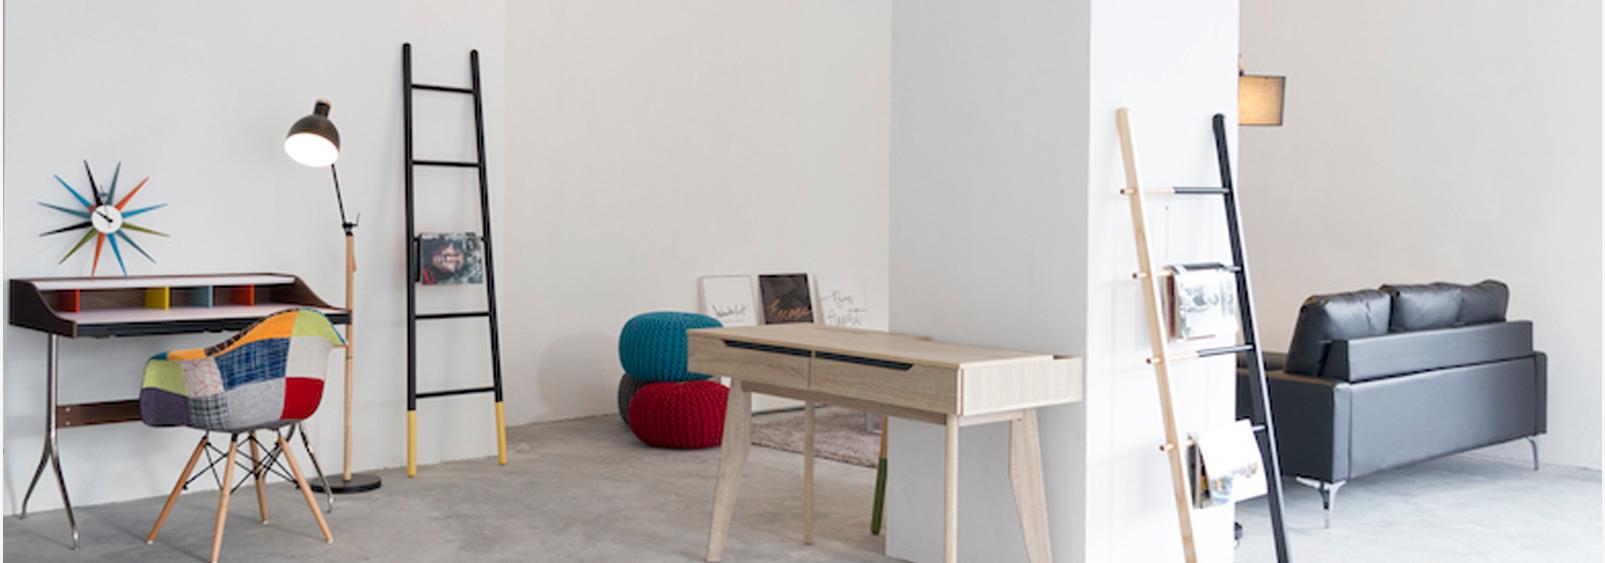 Office Furniture Manufacturers Delhi Ergonomic Office